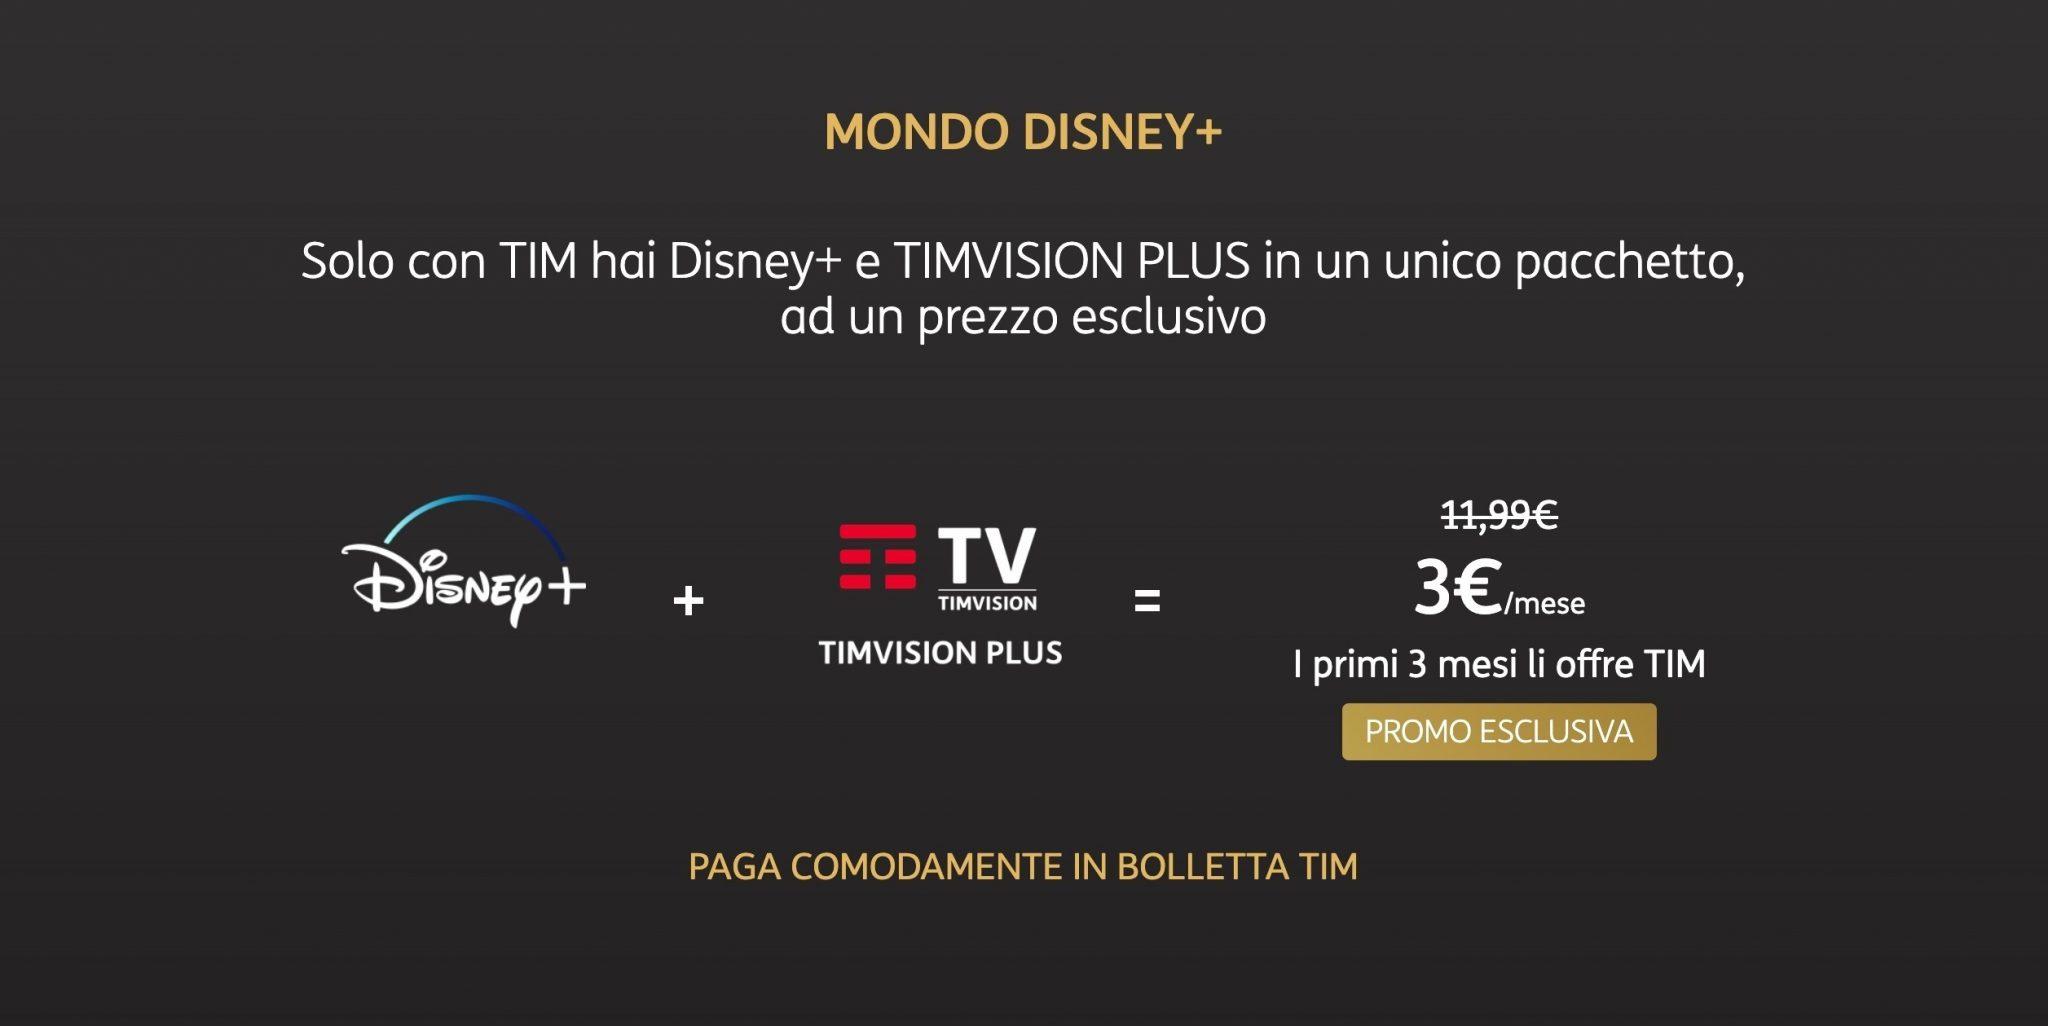 Mondo Disney Plus